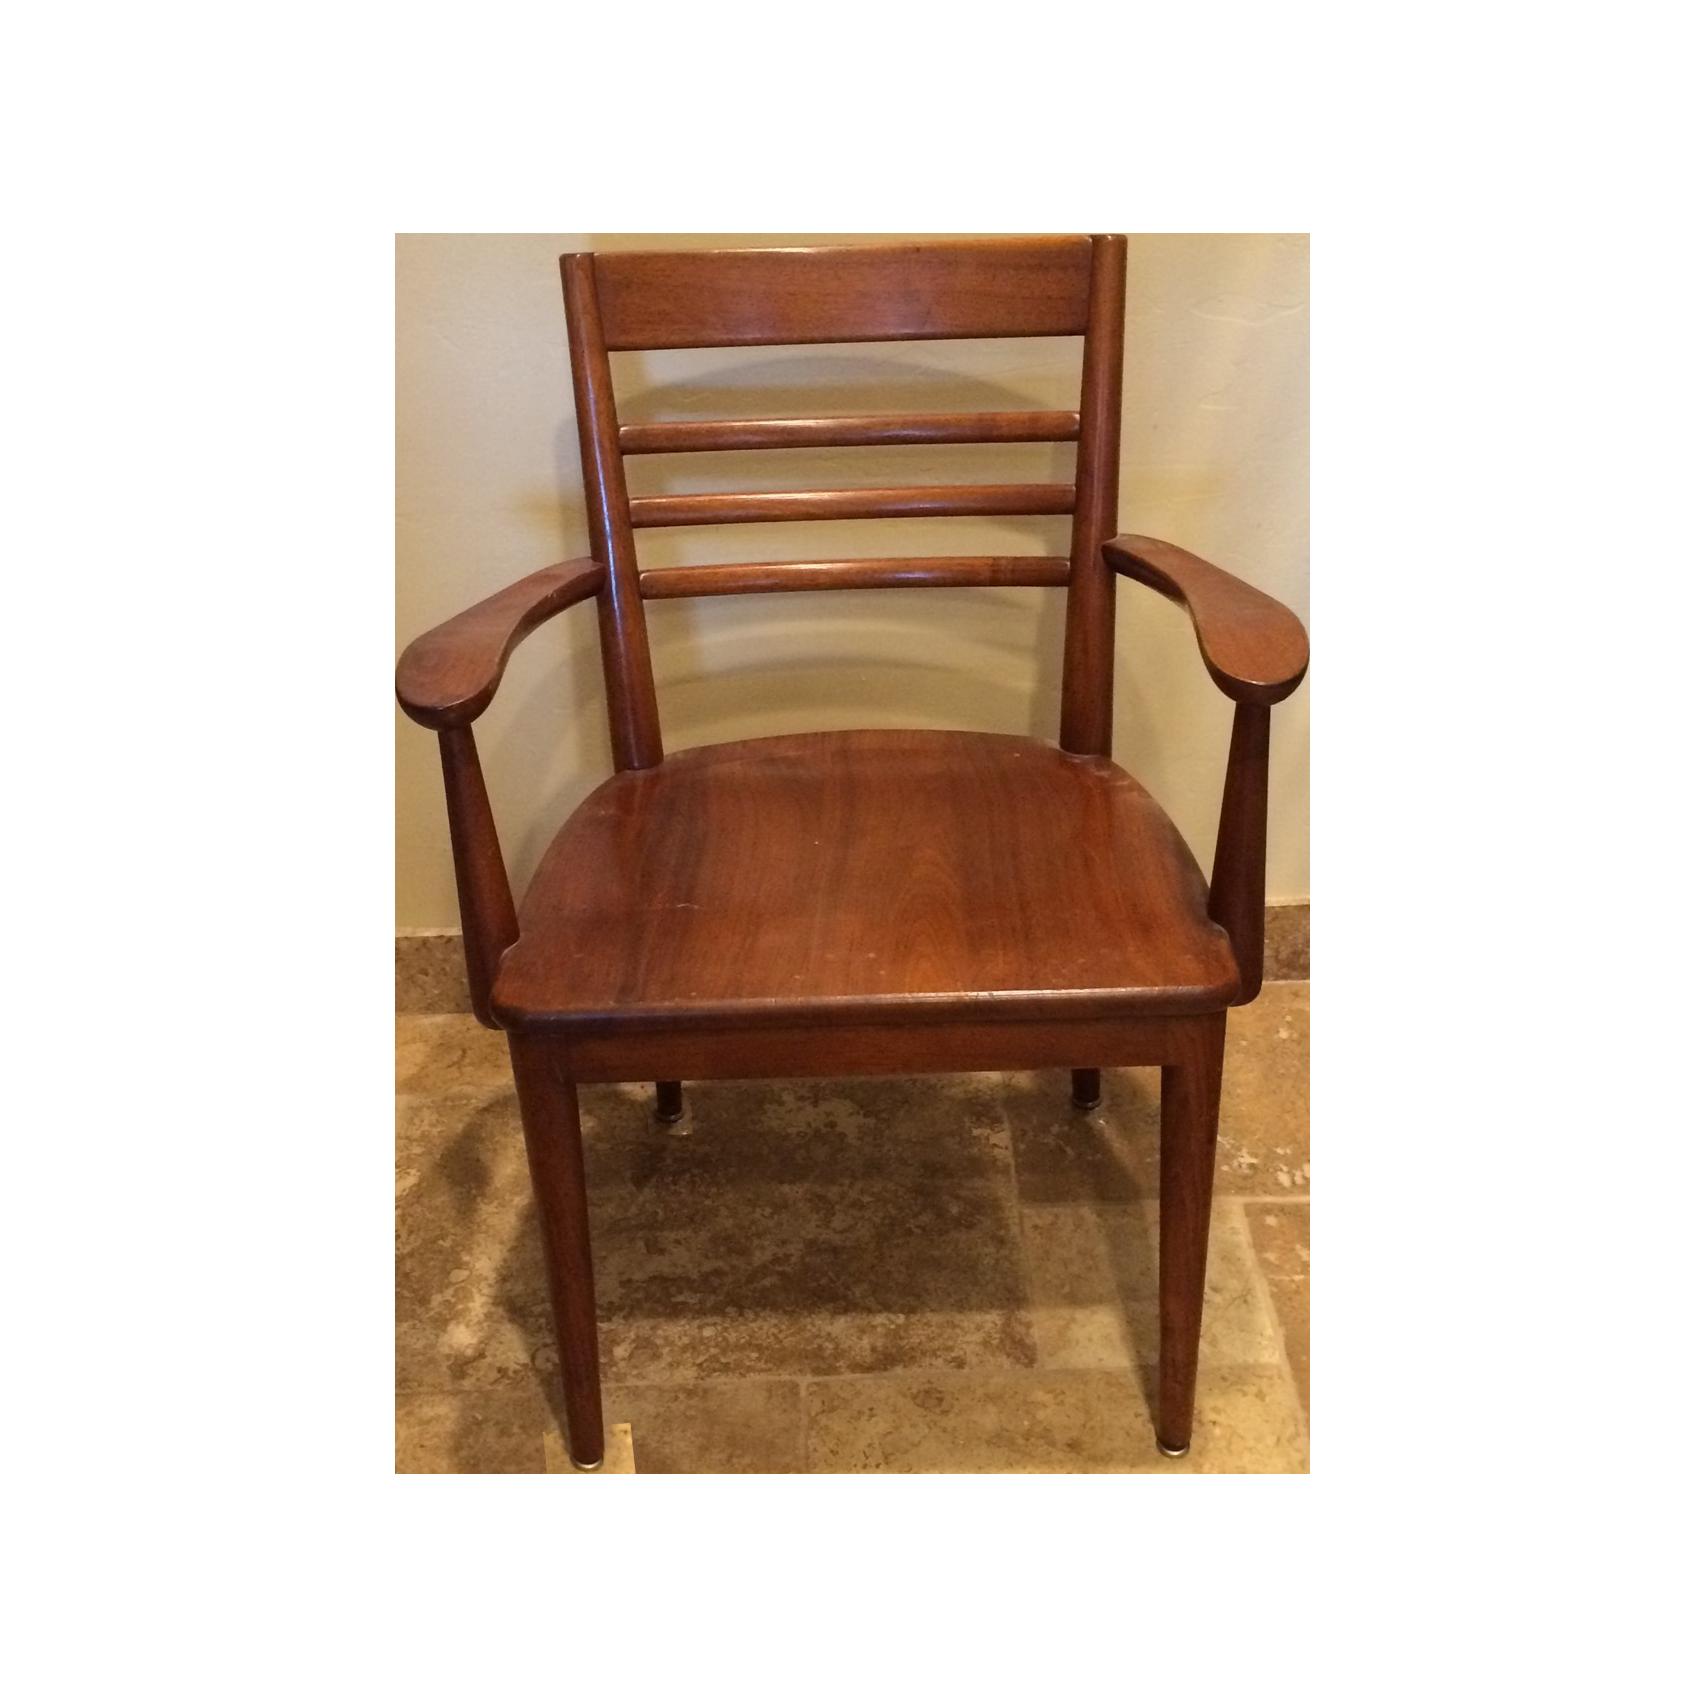 Rare vintage wooden milwaukee chair chairish